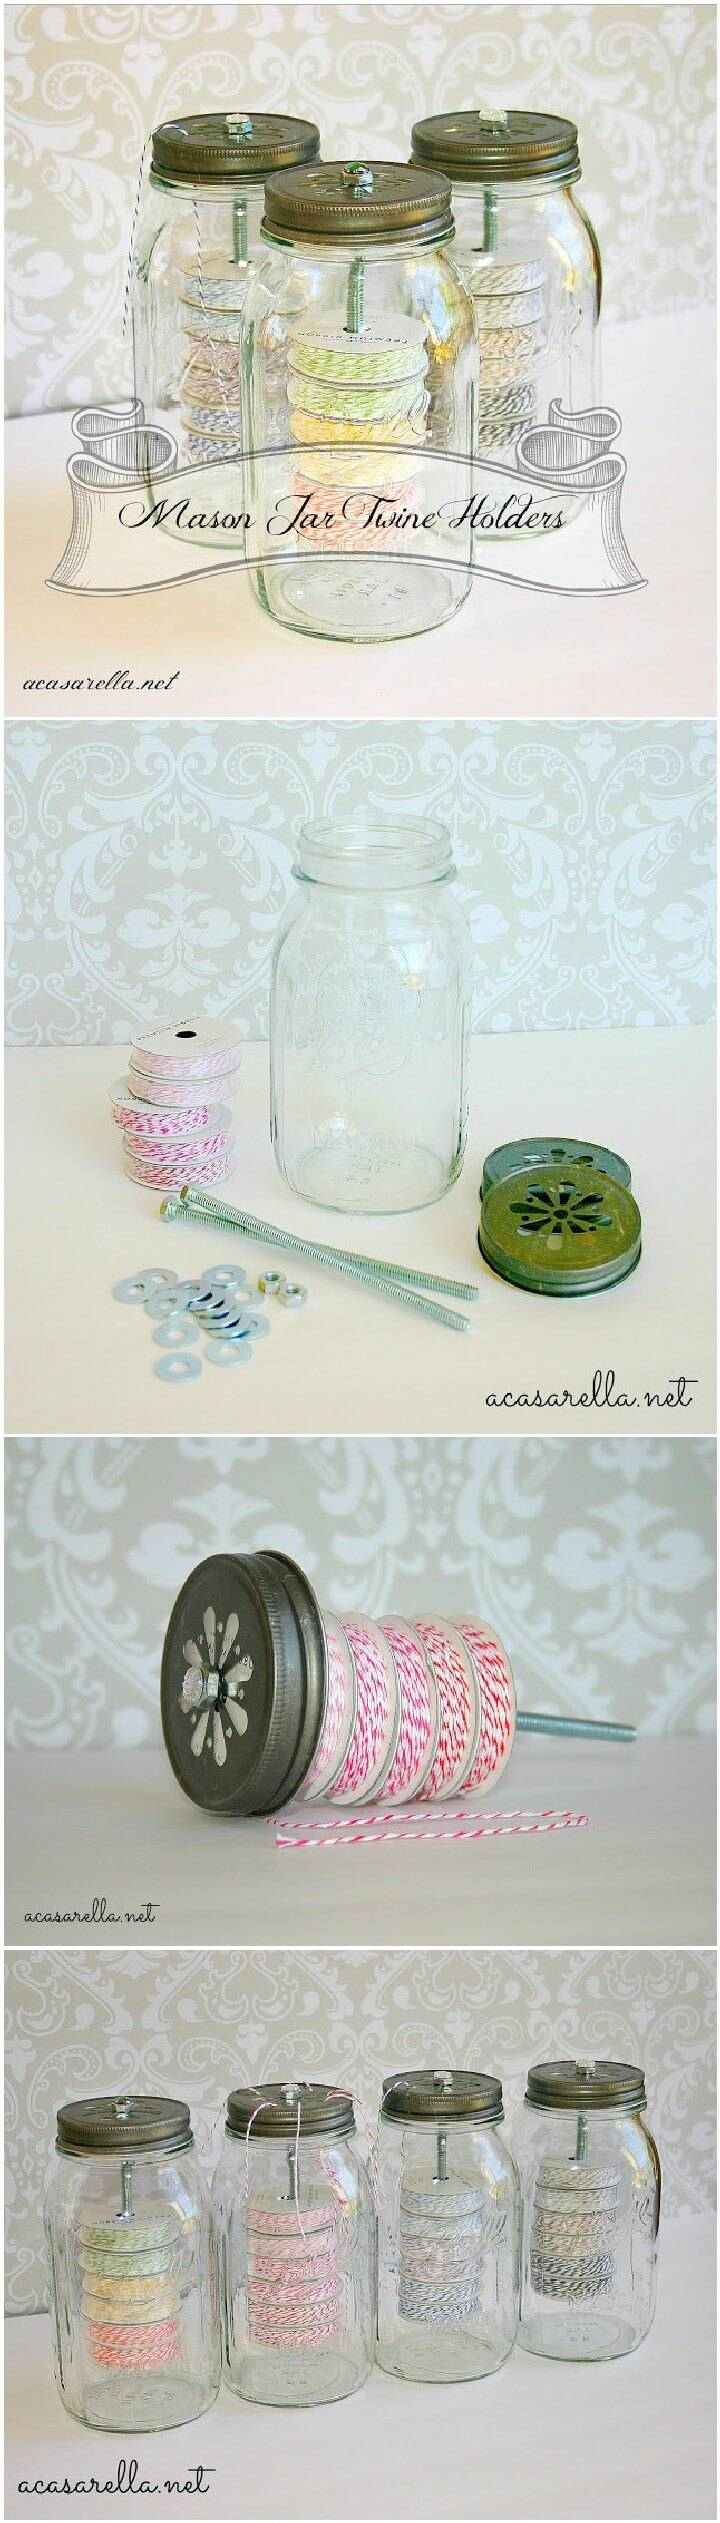 DIY Mason Jar Twine Holders and Dispensers